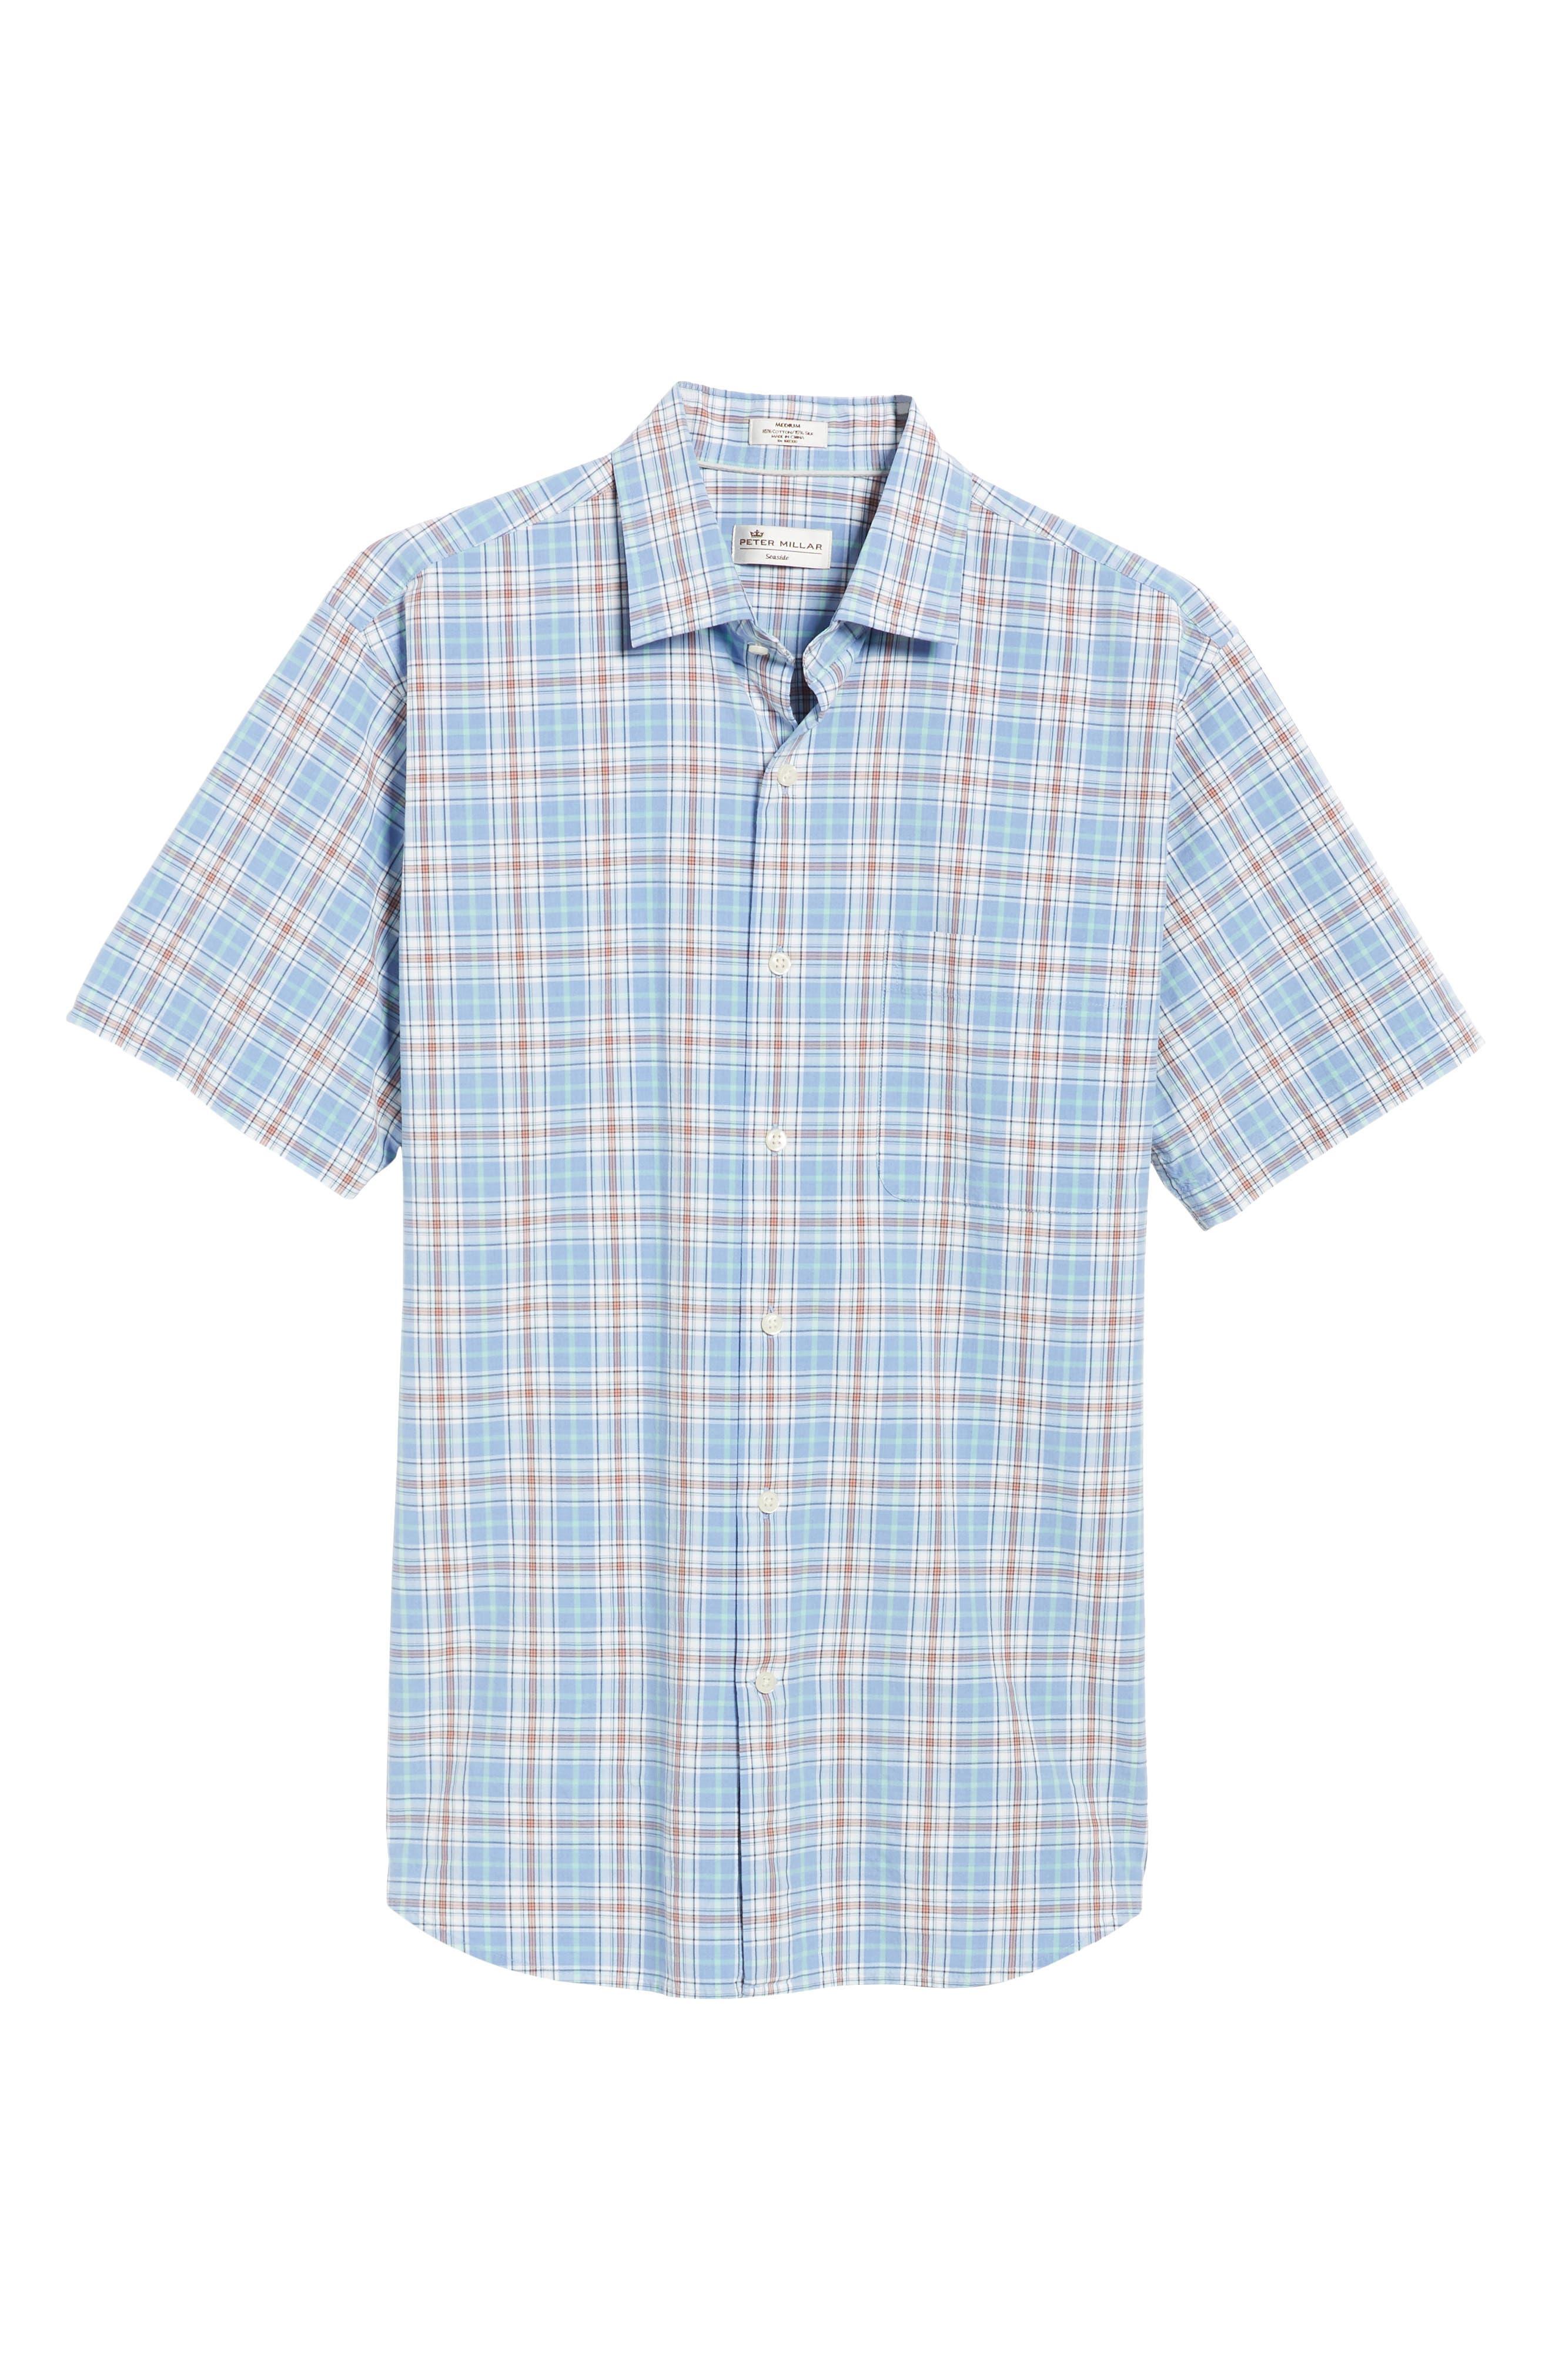 Rockport Plaid Sport Shirt,                             Alternate thumbnail 6, color,                             407